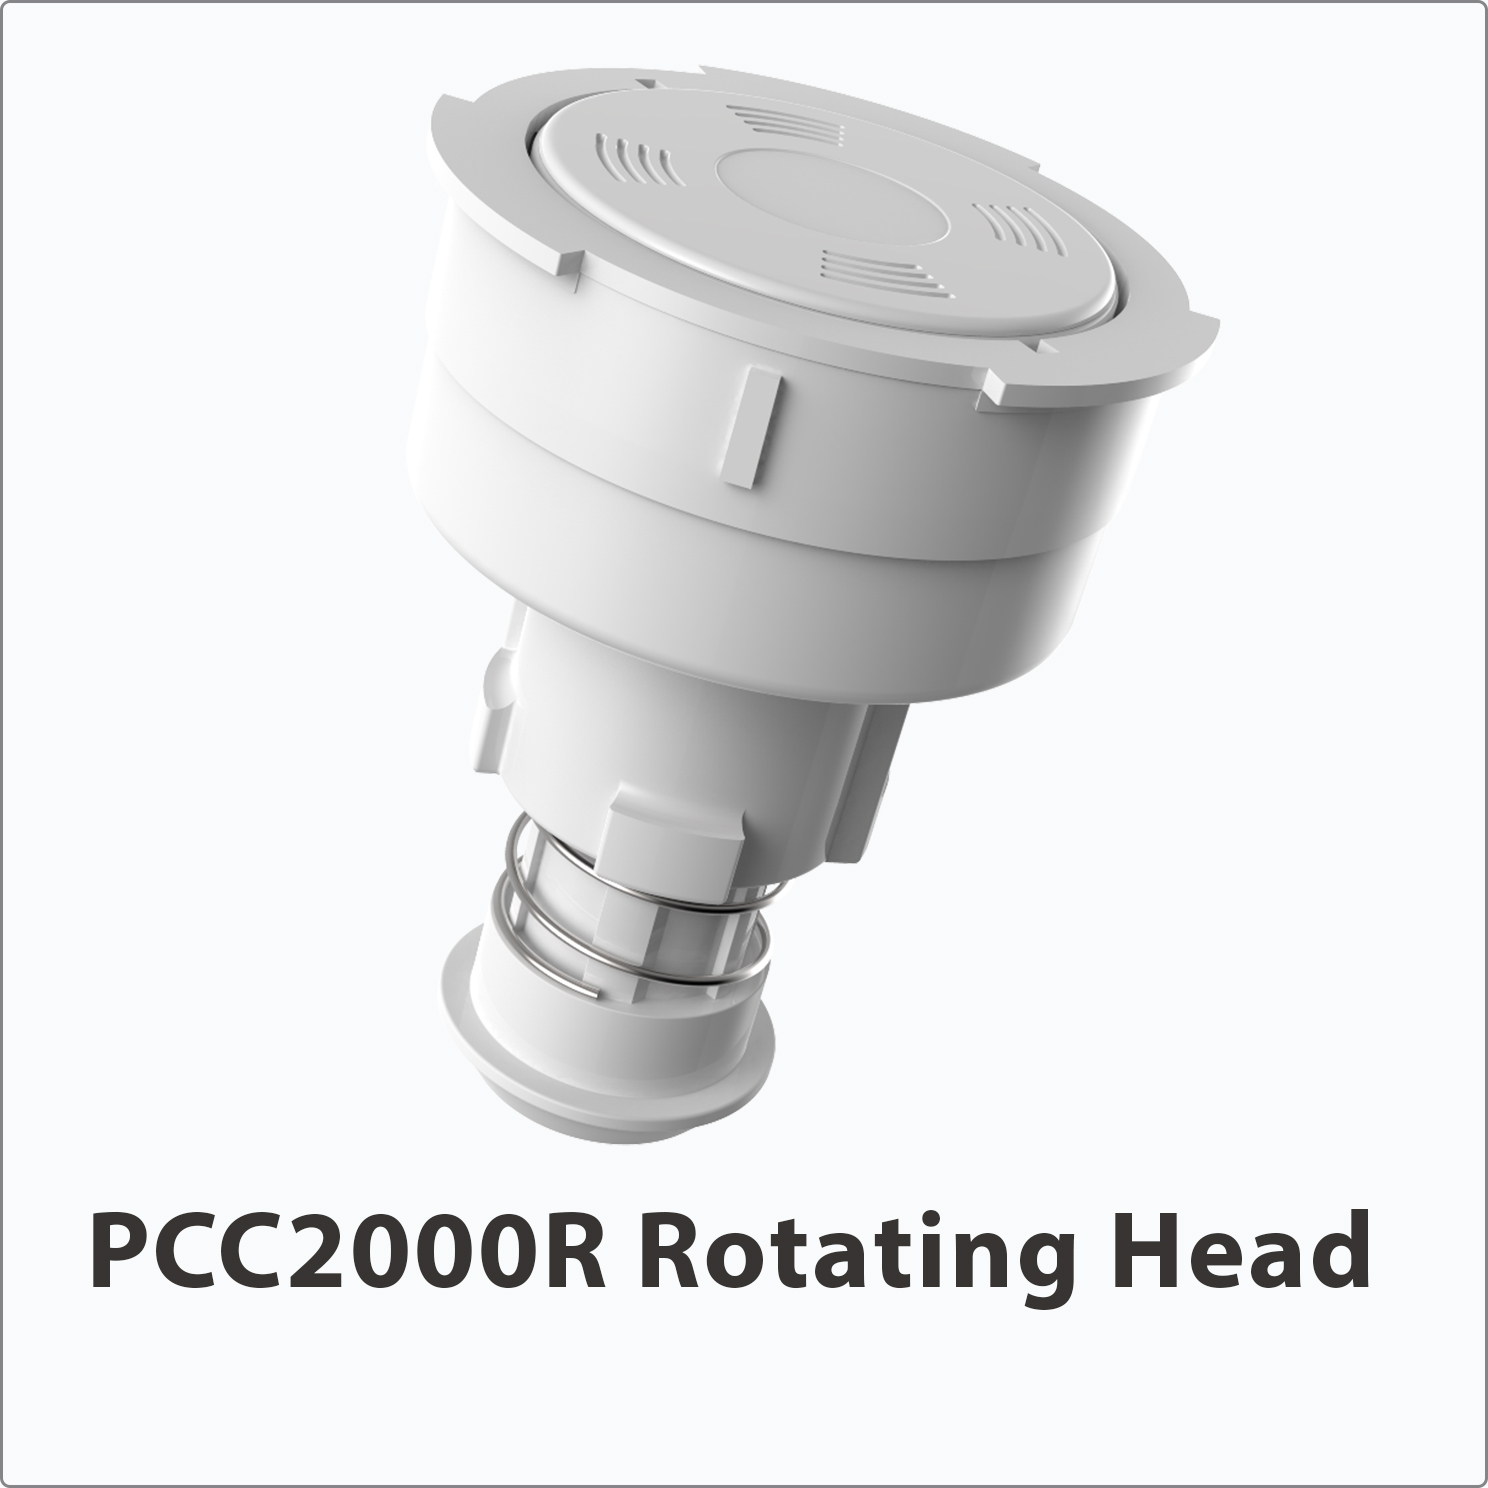 PCC2000R Head.jpg